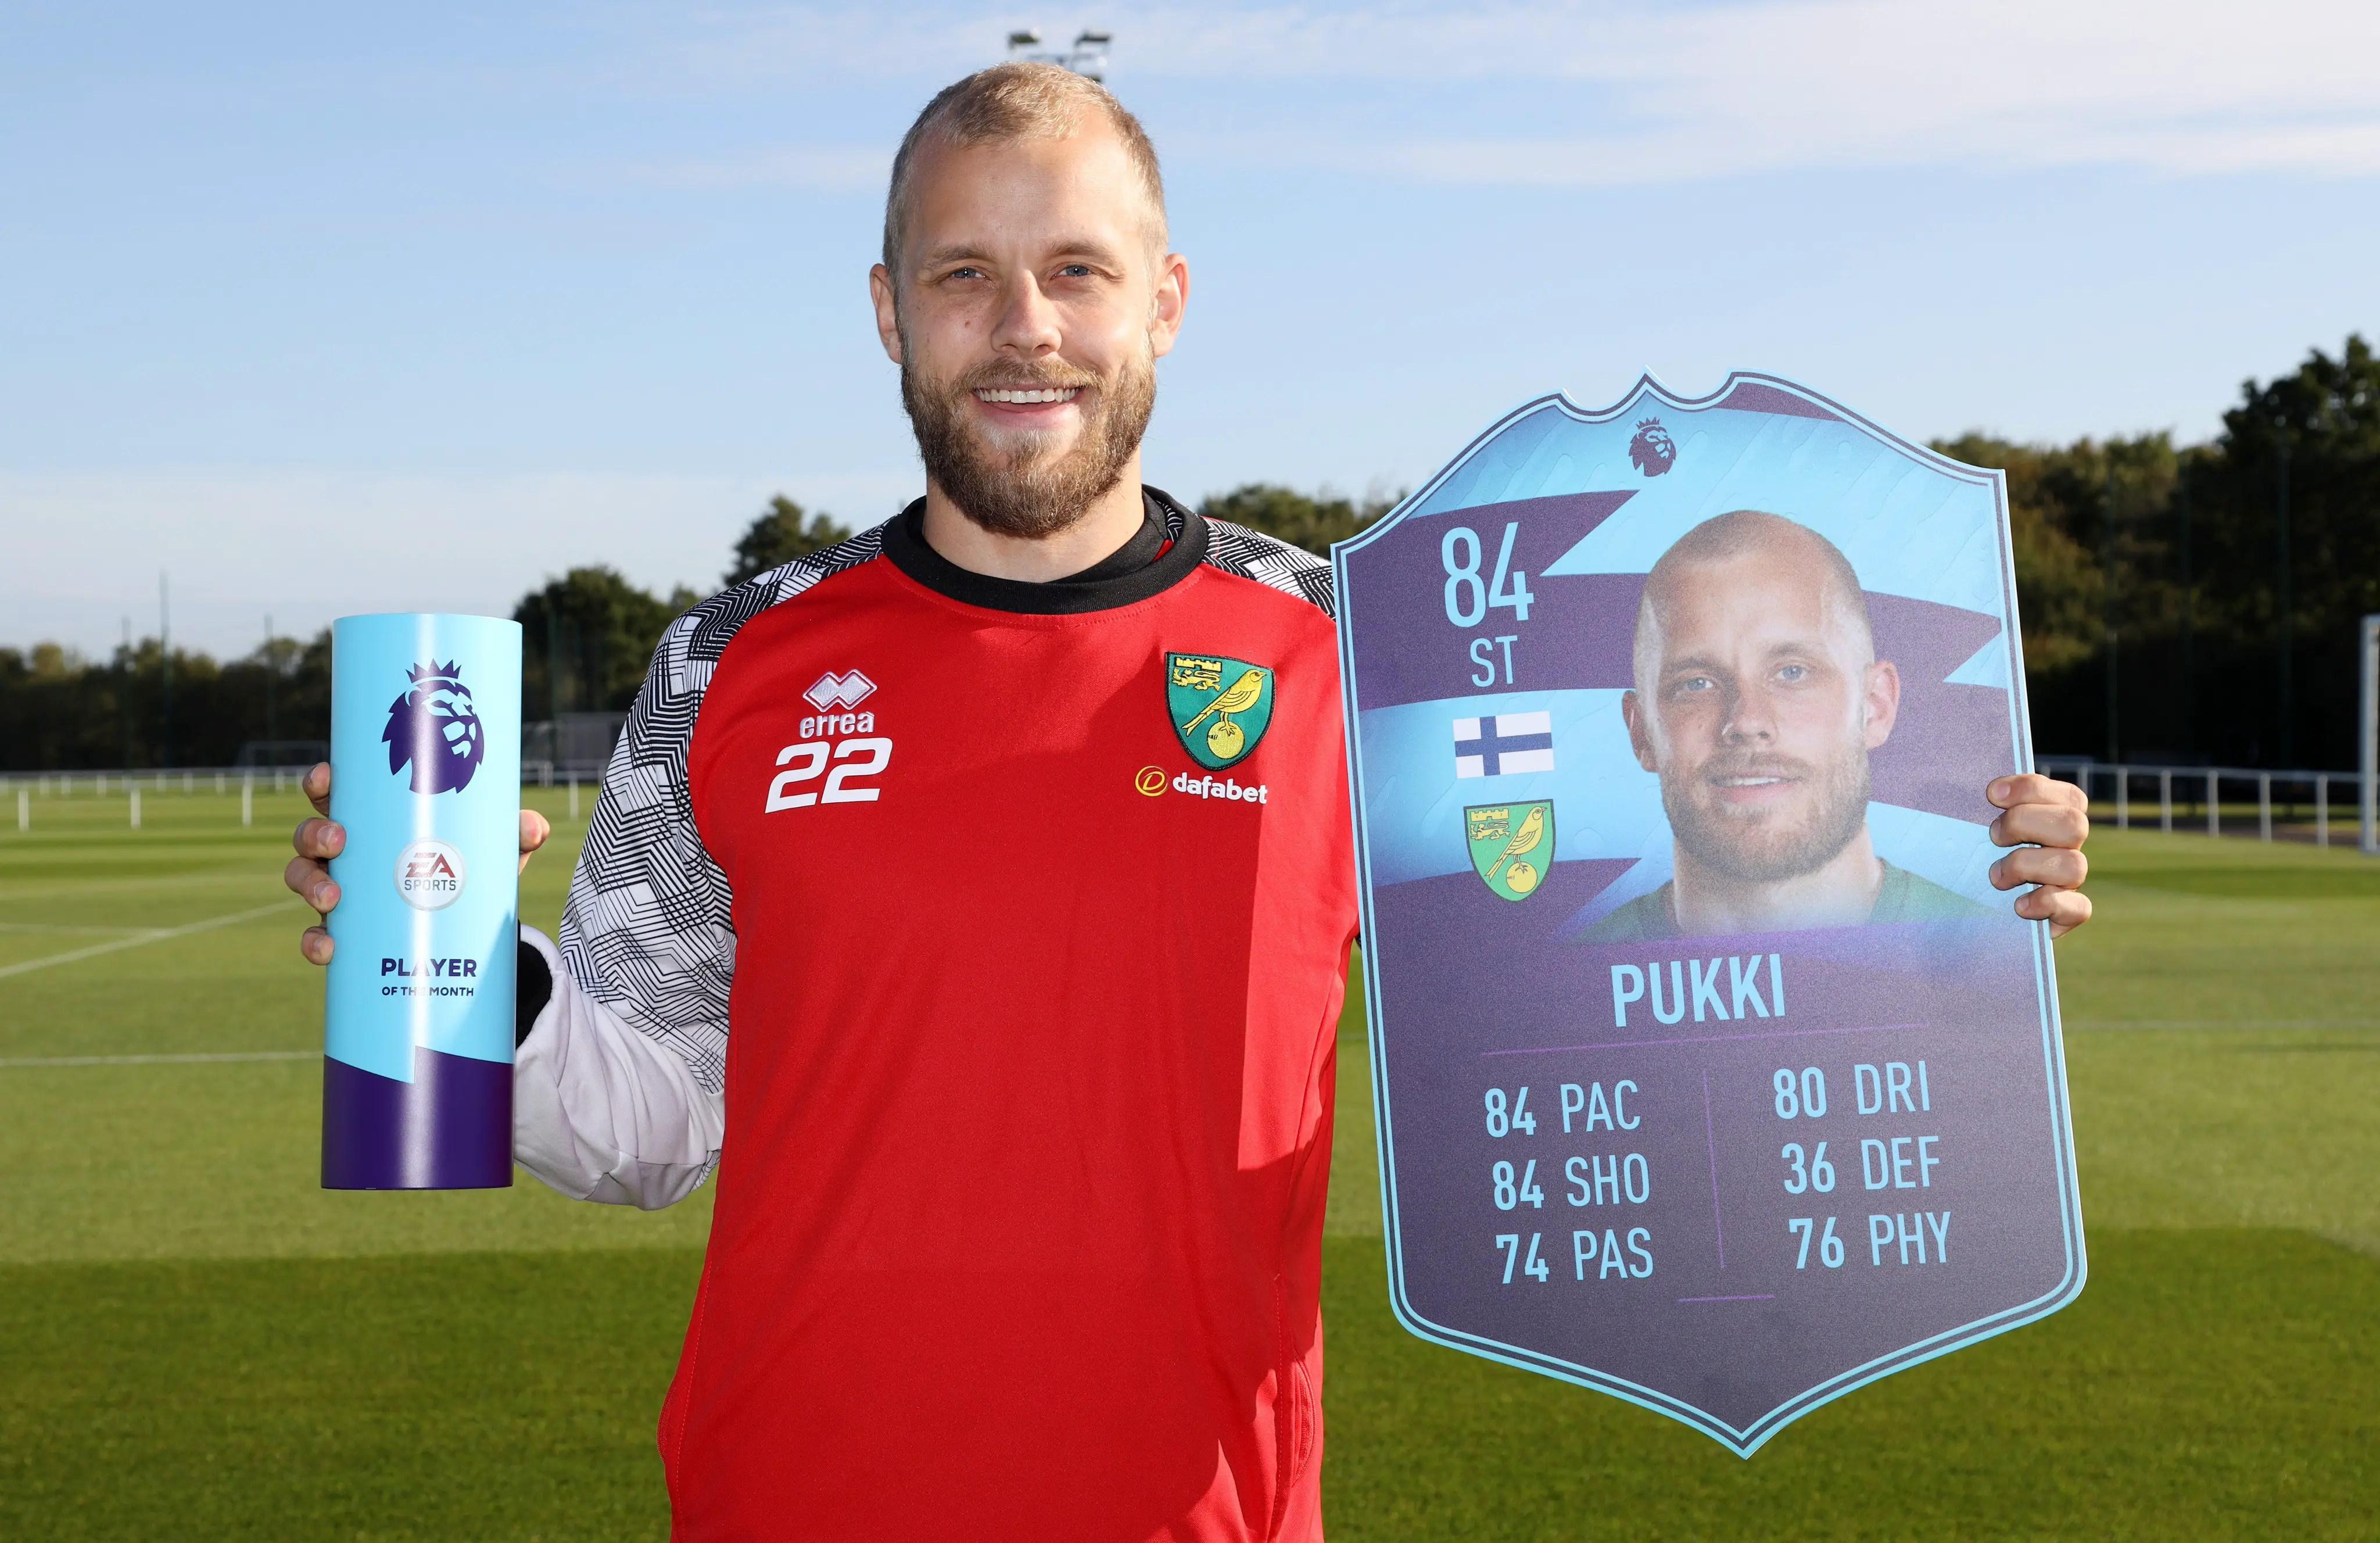 Pukki,  Klopp Win August Premier League Awards